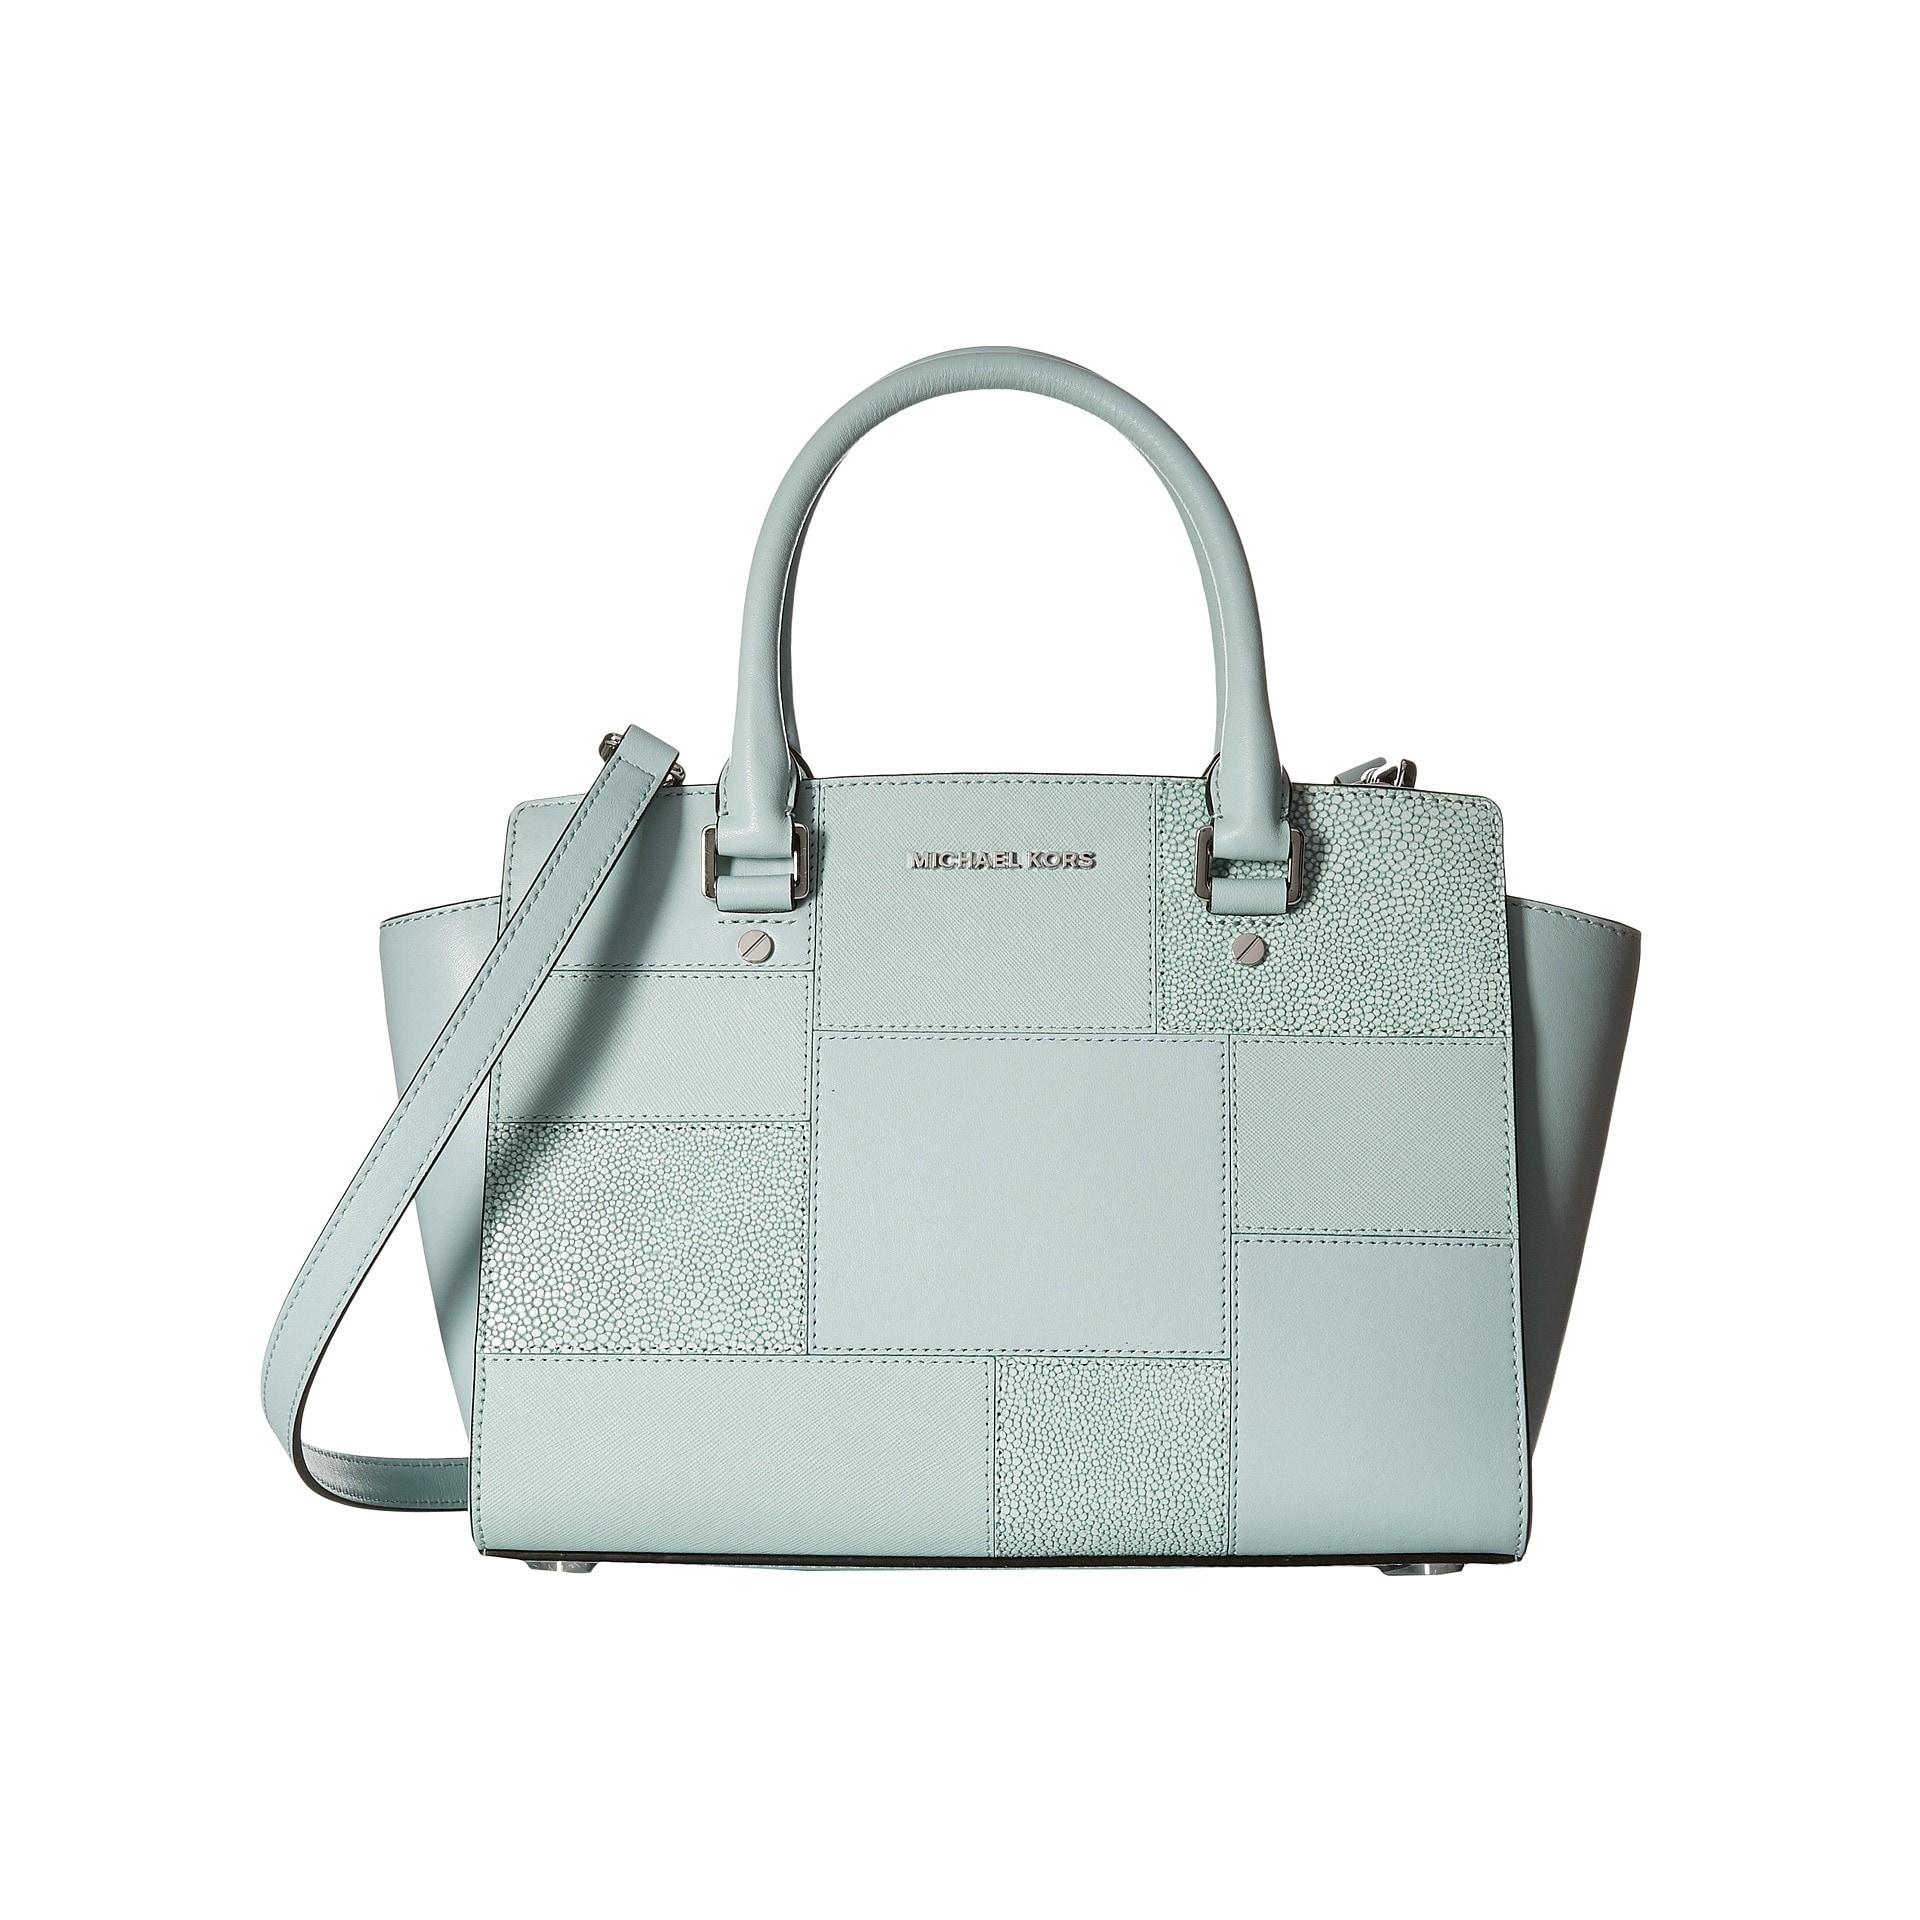 Michael Kors Selma Celedon Medium Top-zip Satchel Handbag - Free Shipping  Today - Overstock.com - 18938844